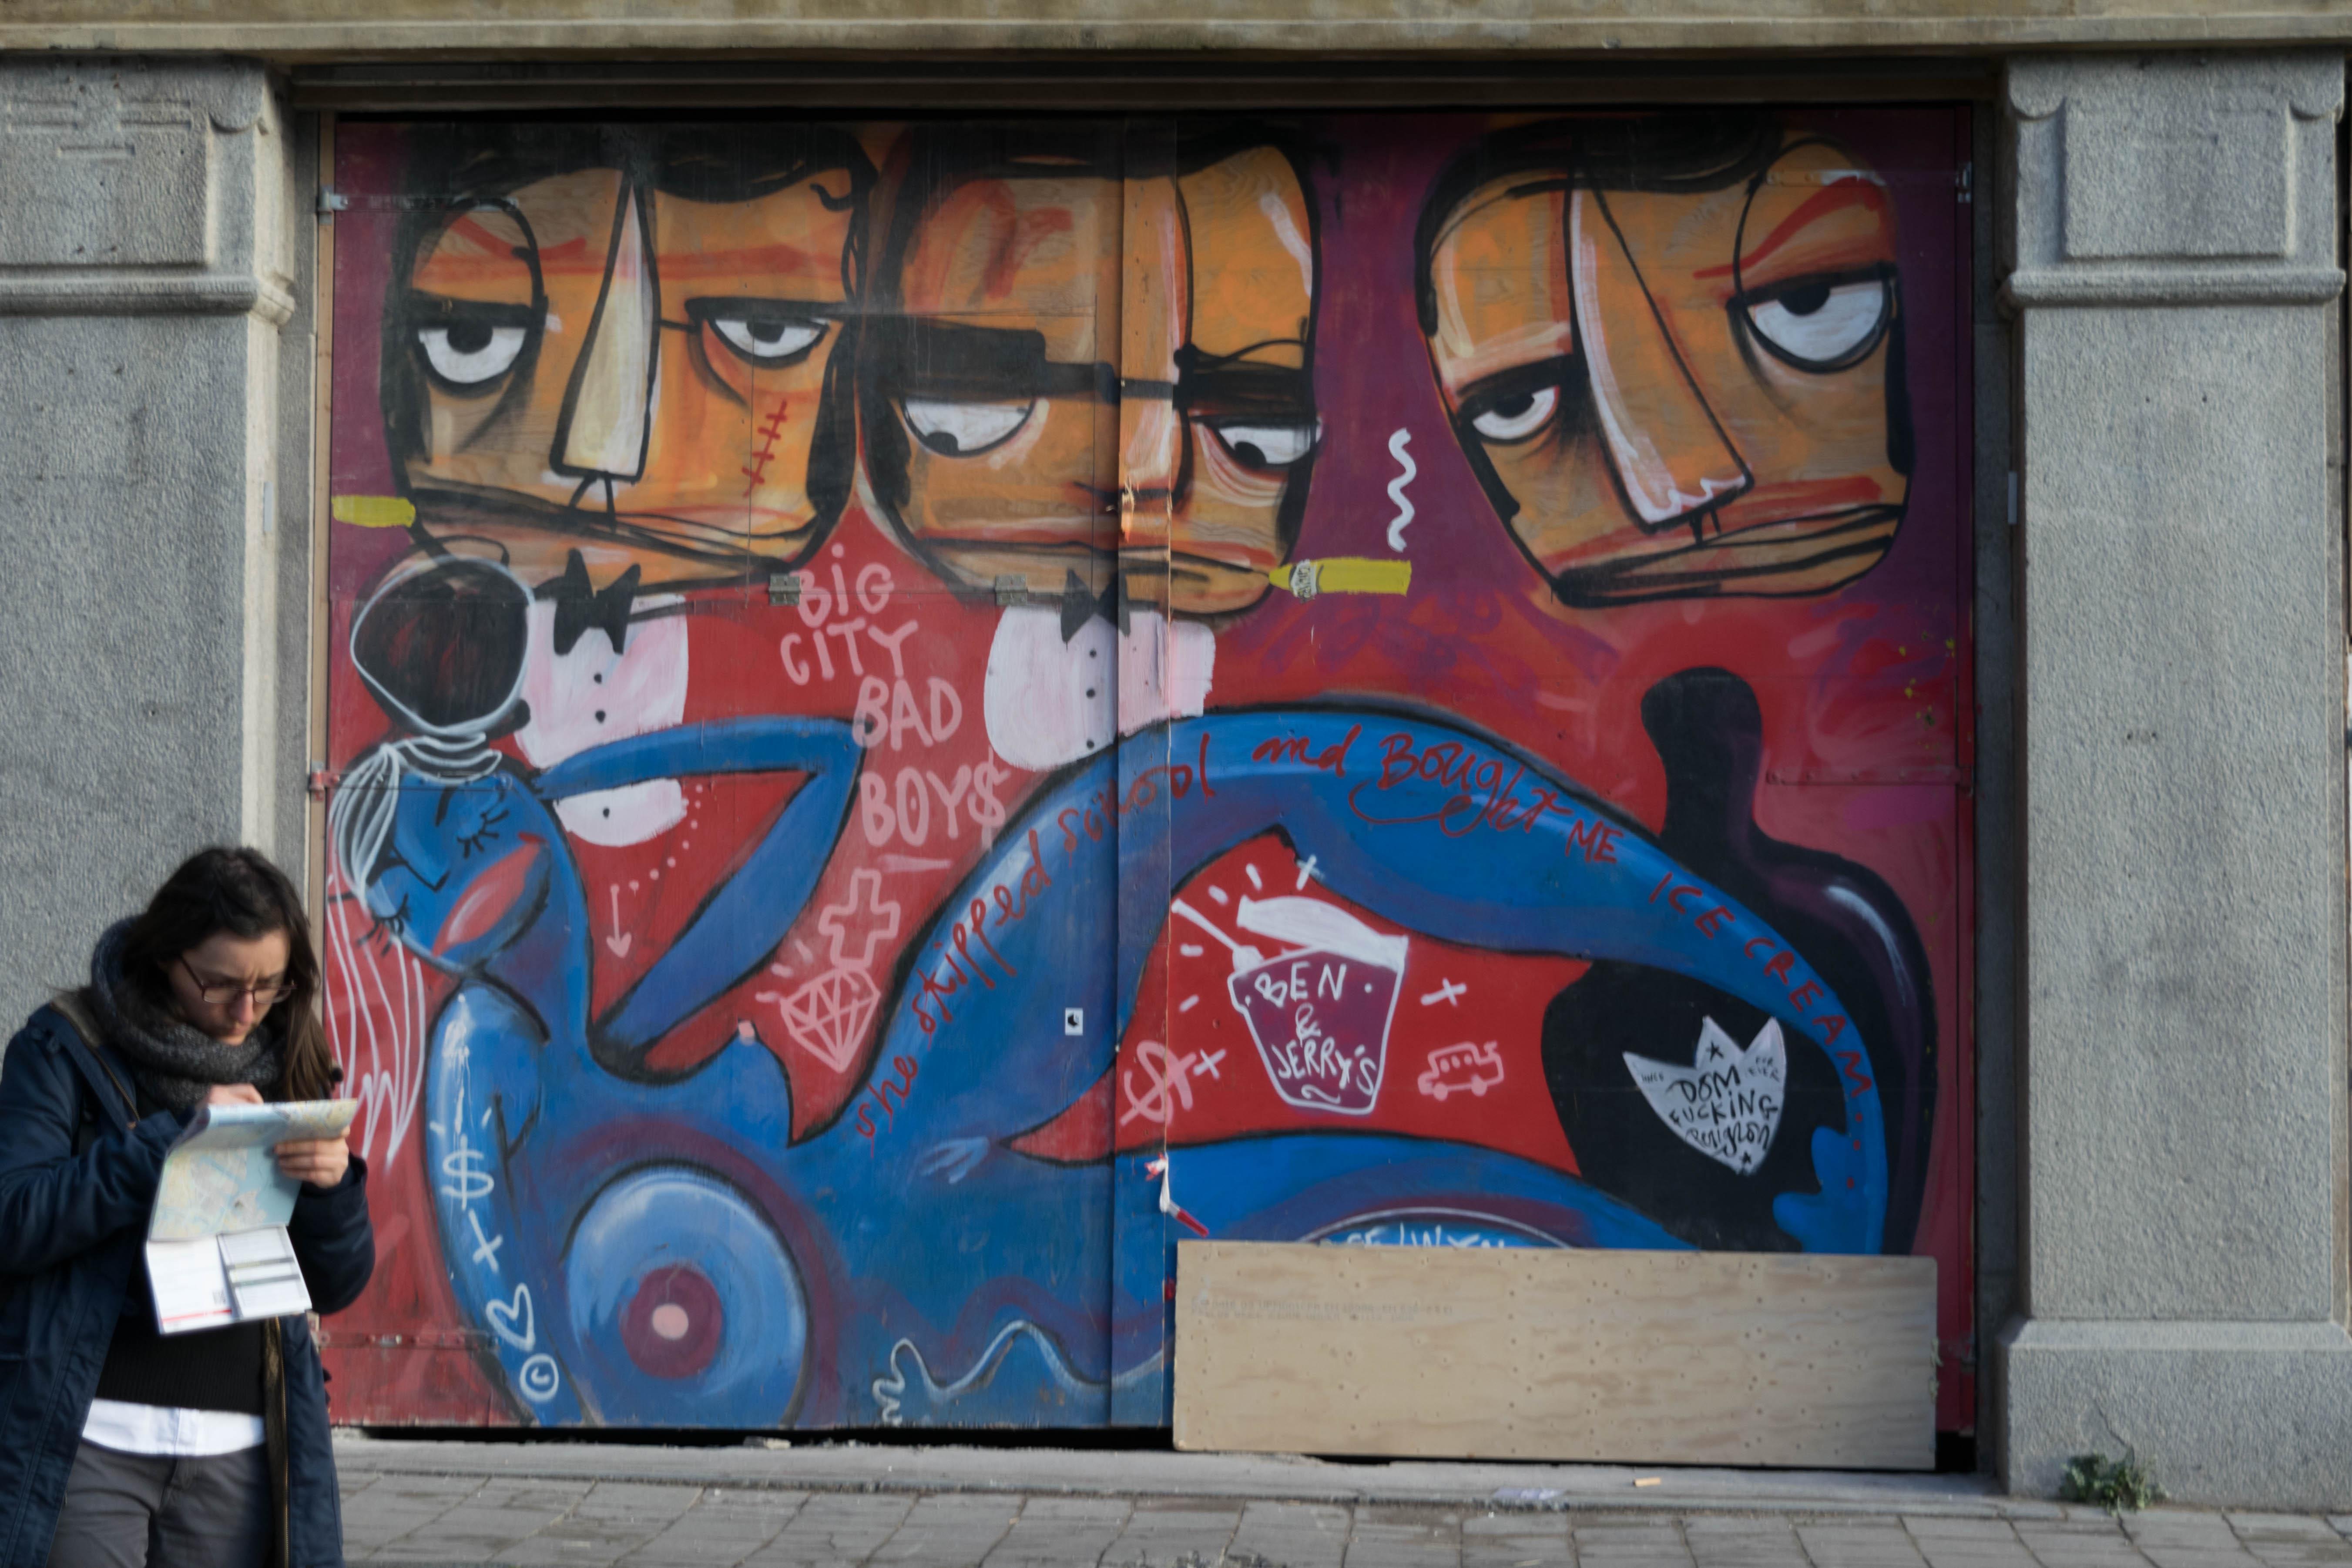 Graffiti Urban Art As A Gentrifier TheProtoCitycomTheProtoCitycom - Amazing graffiti alters perspective space